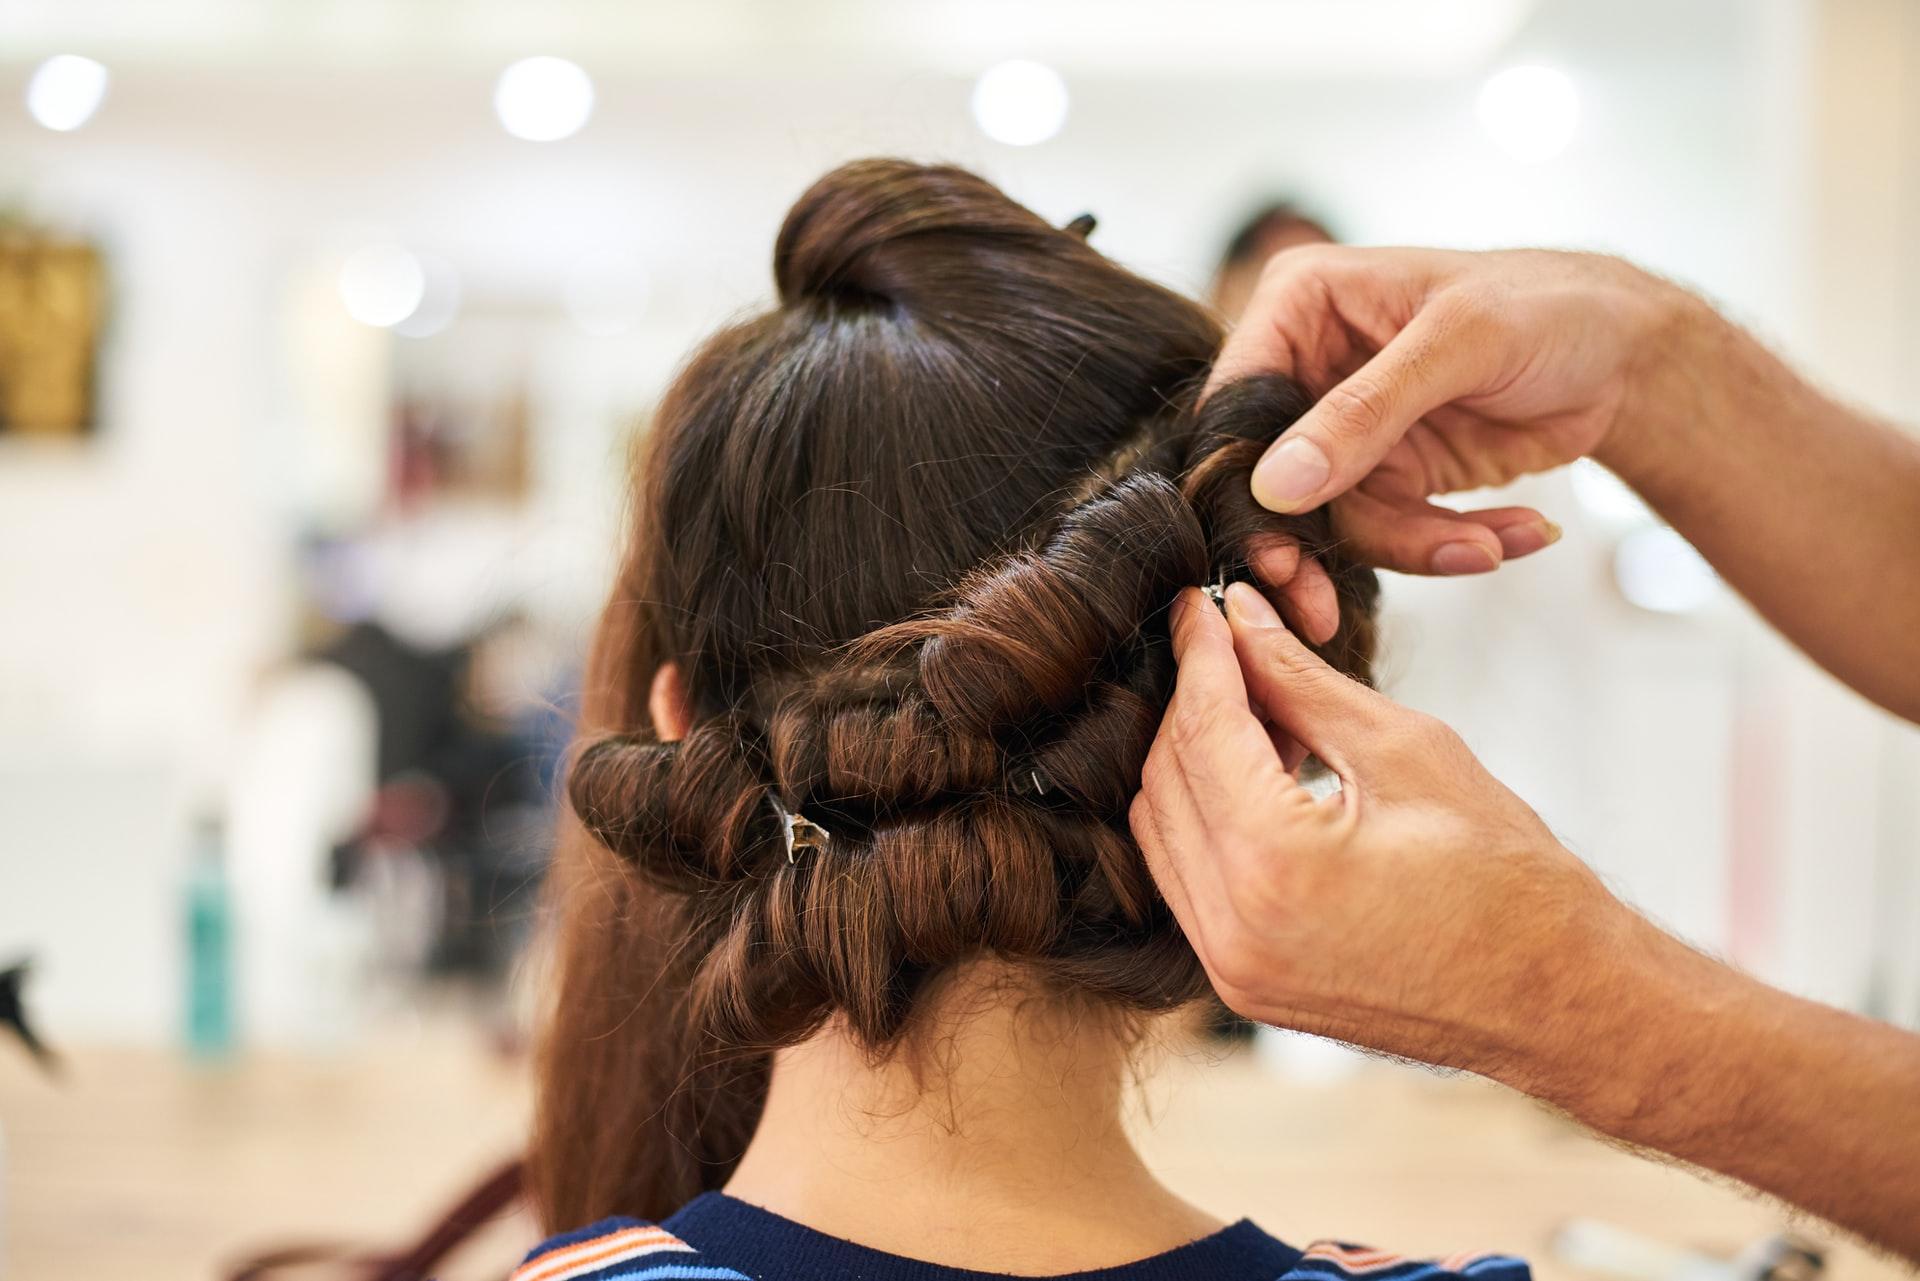 Koopr-coiffure-salon-enginakyurt-Unsplash